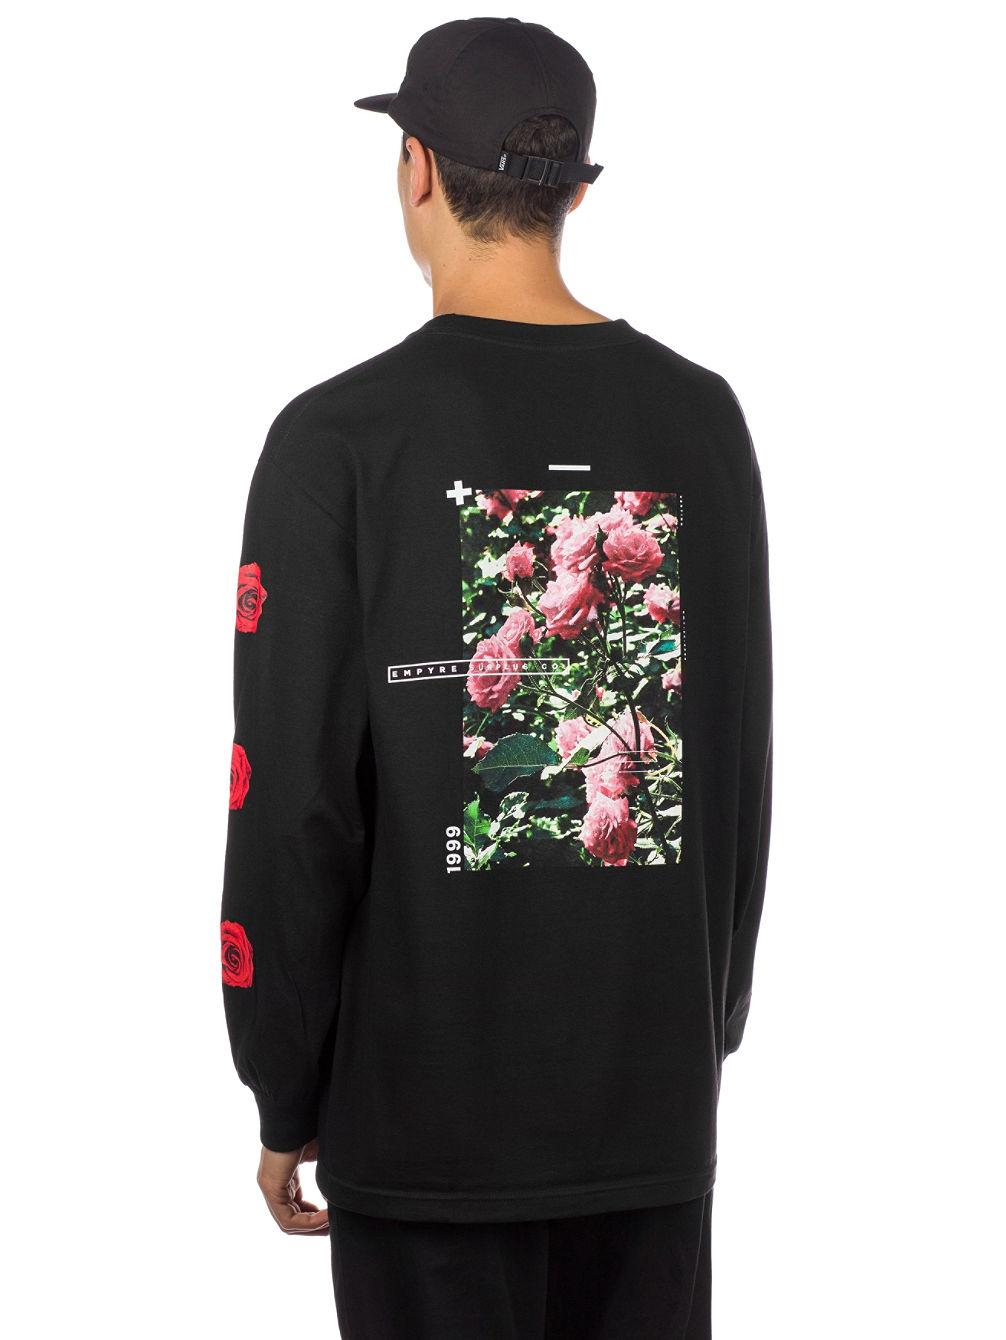 b9506fe9fe79 Buy Empyre Vertigo Rose Long Sleeve T-Shirt online at Blue Tomato